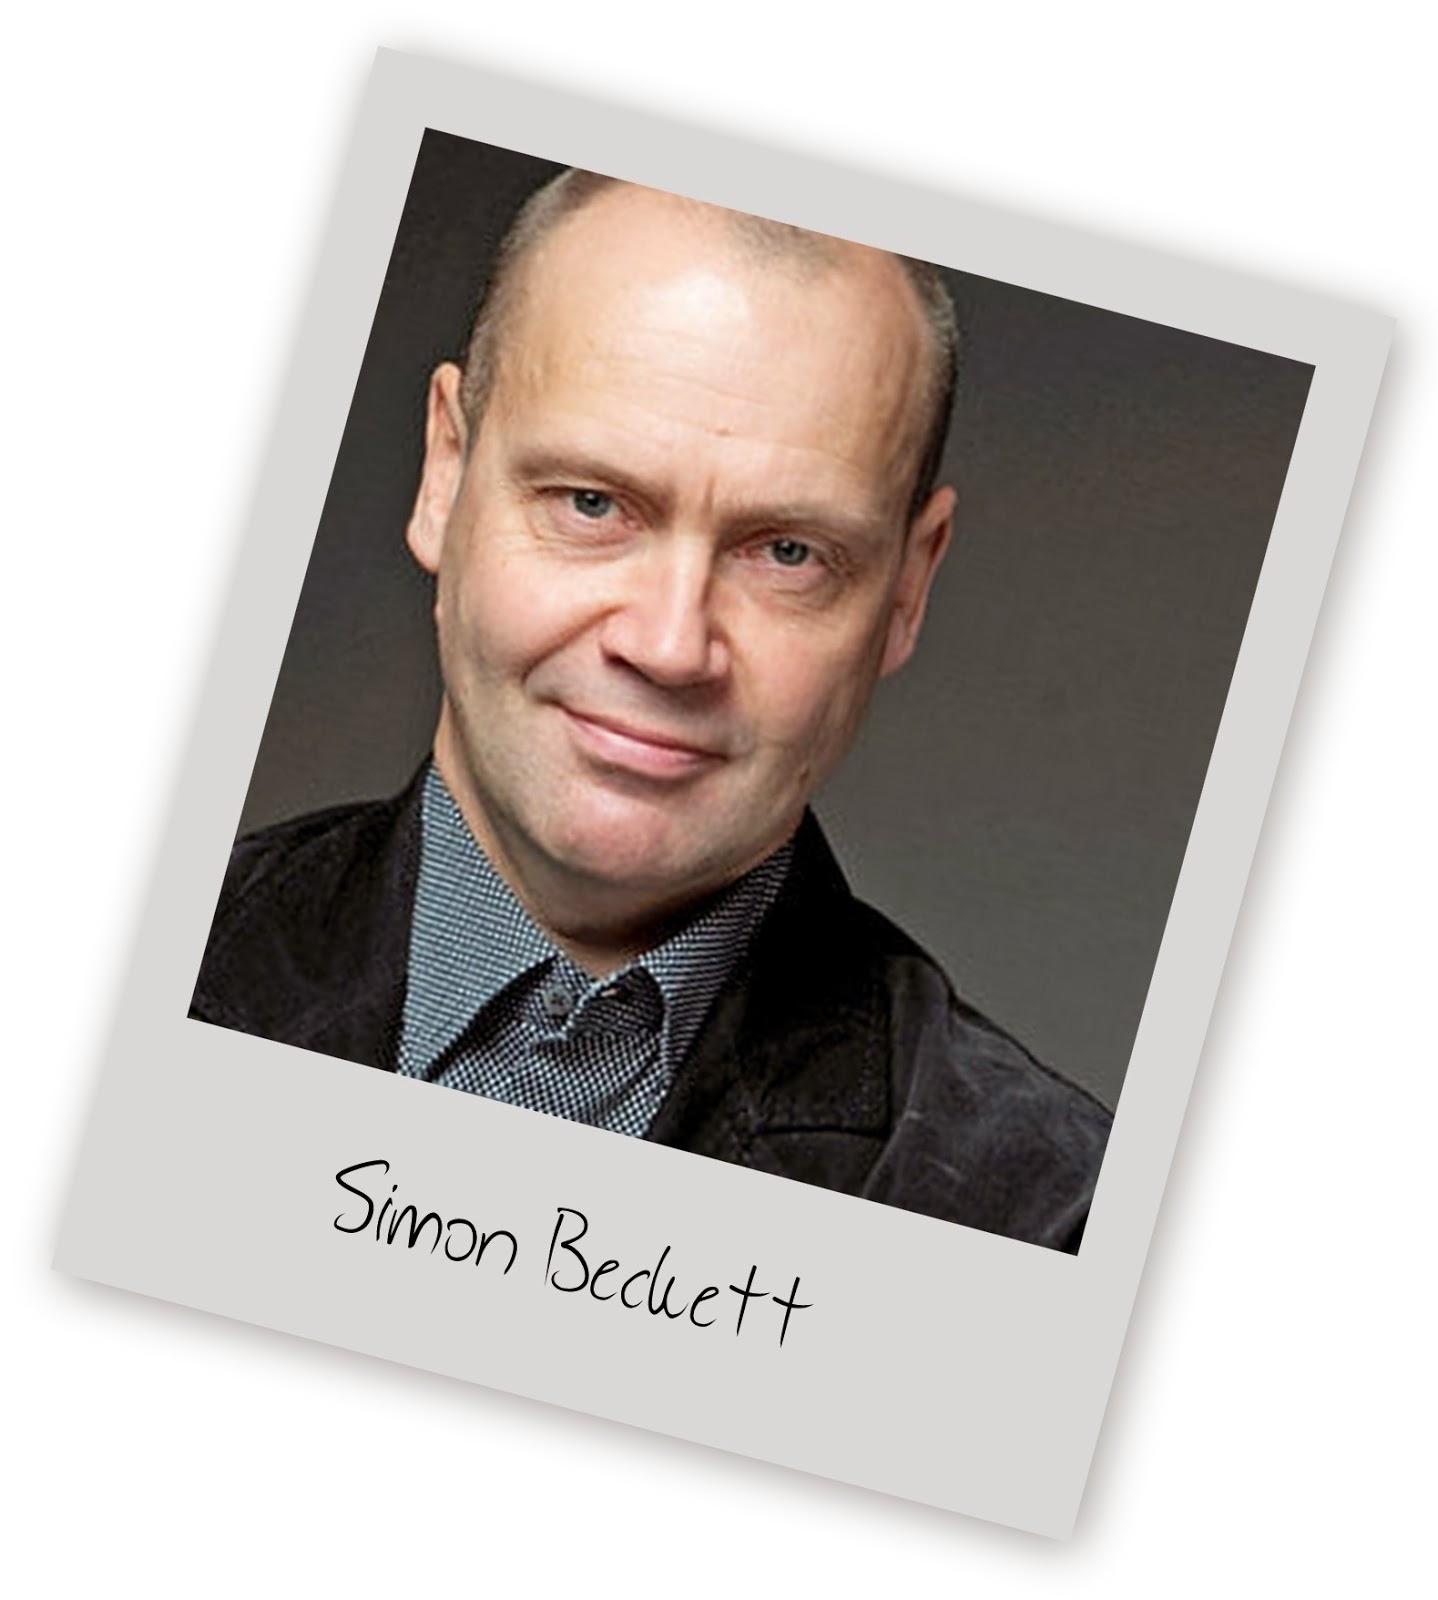 Simon Beckett net worth